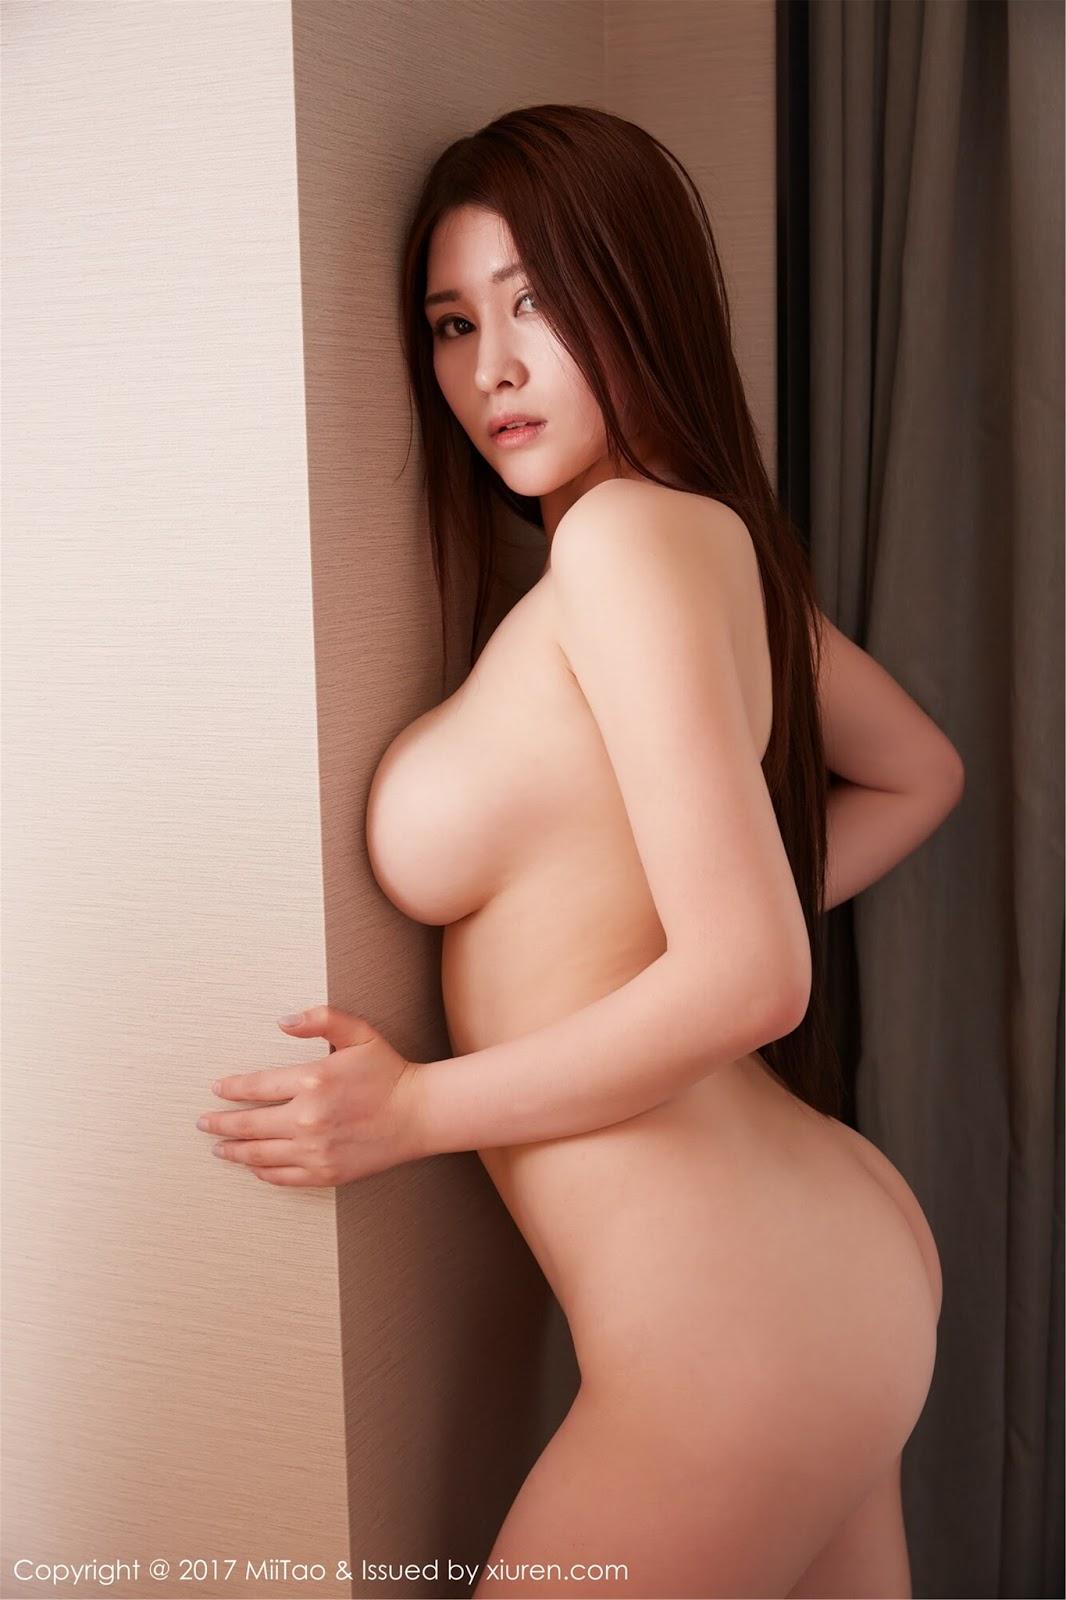 chet-sung-vi-nang-mau-bing-lu-nude-100-6